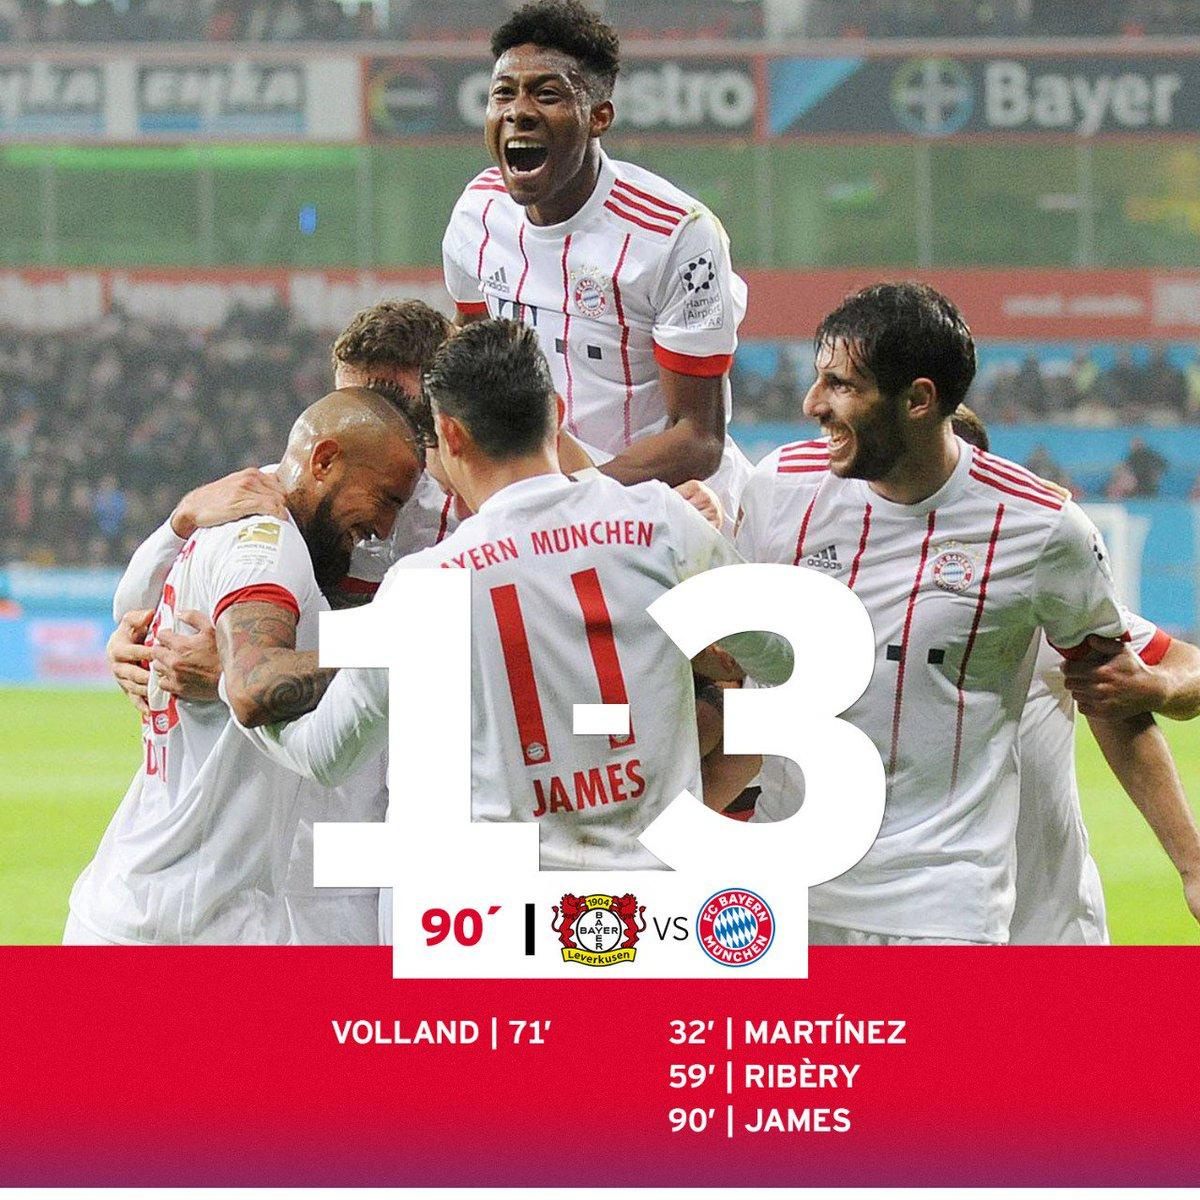 RT @FCBayern: AUSWÄRTSSIEG! 1⃣. Pflichtspiel 2018. 1⃣. ganz wichtiger Dreier. Jaaaaaaaaaaaa! 🔴⚪🤩 #B04FCB #MiaSanMia https://t.co/XsydAgTJci